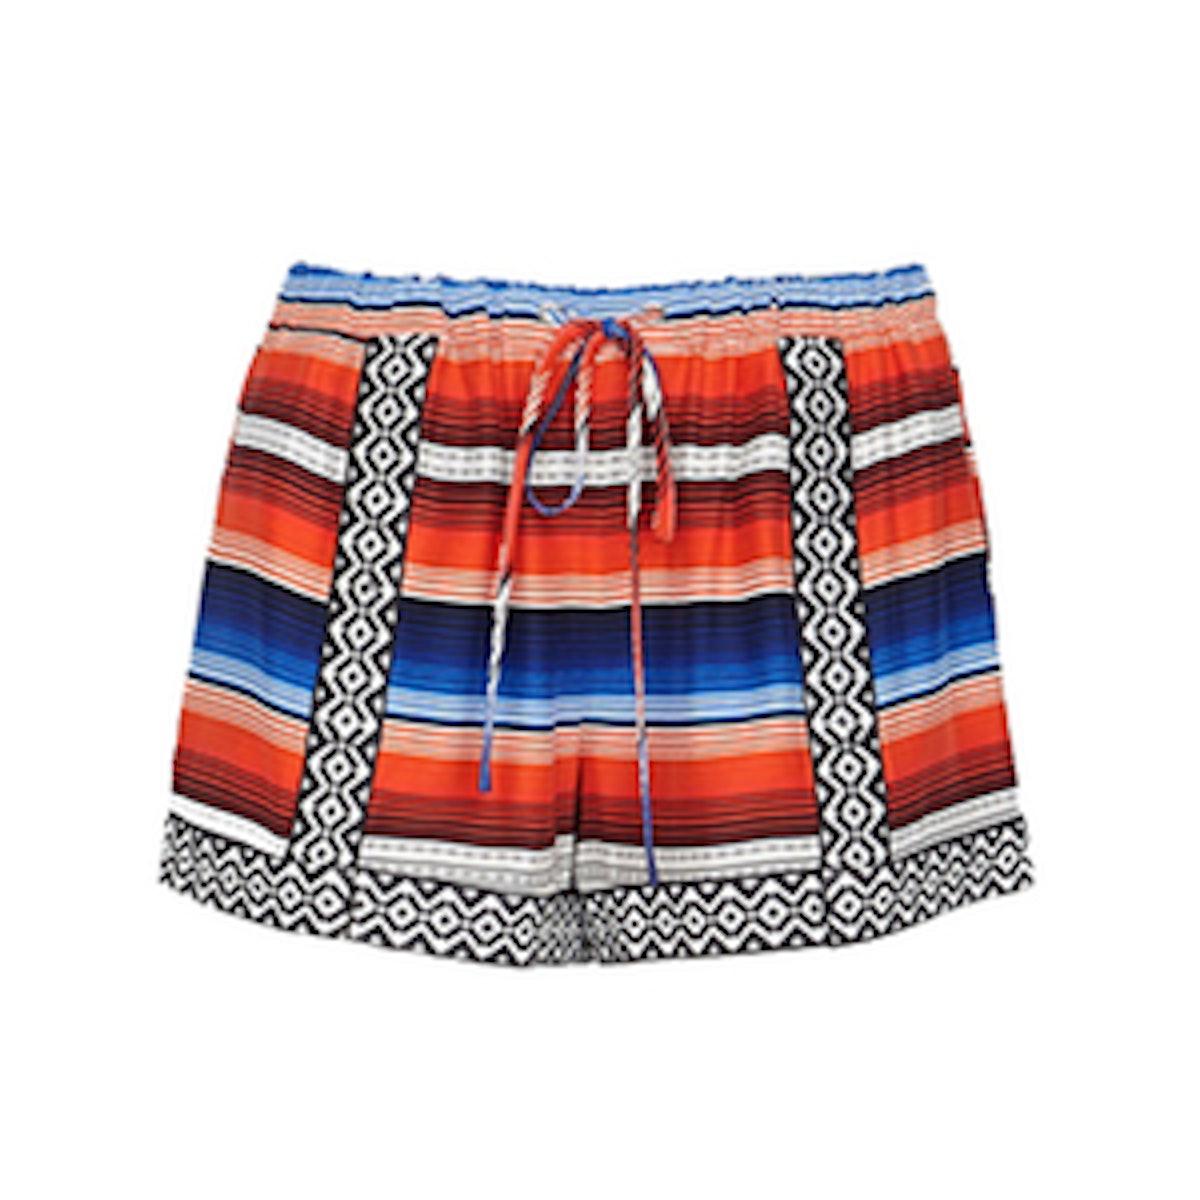 Applique Printed Drawstring Shorts